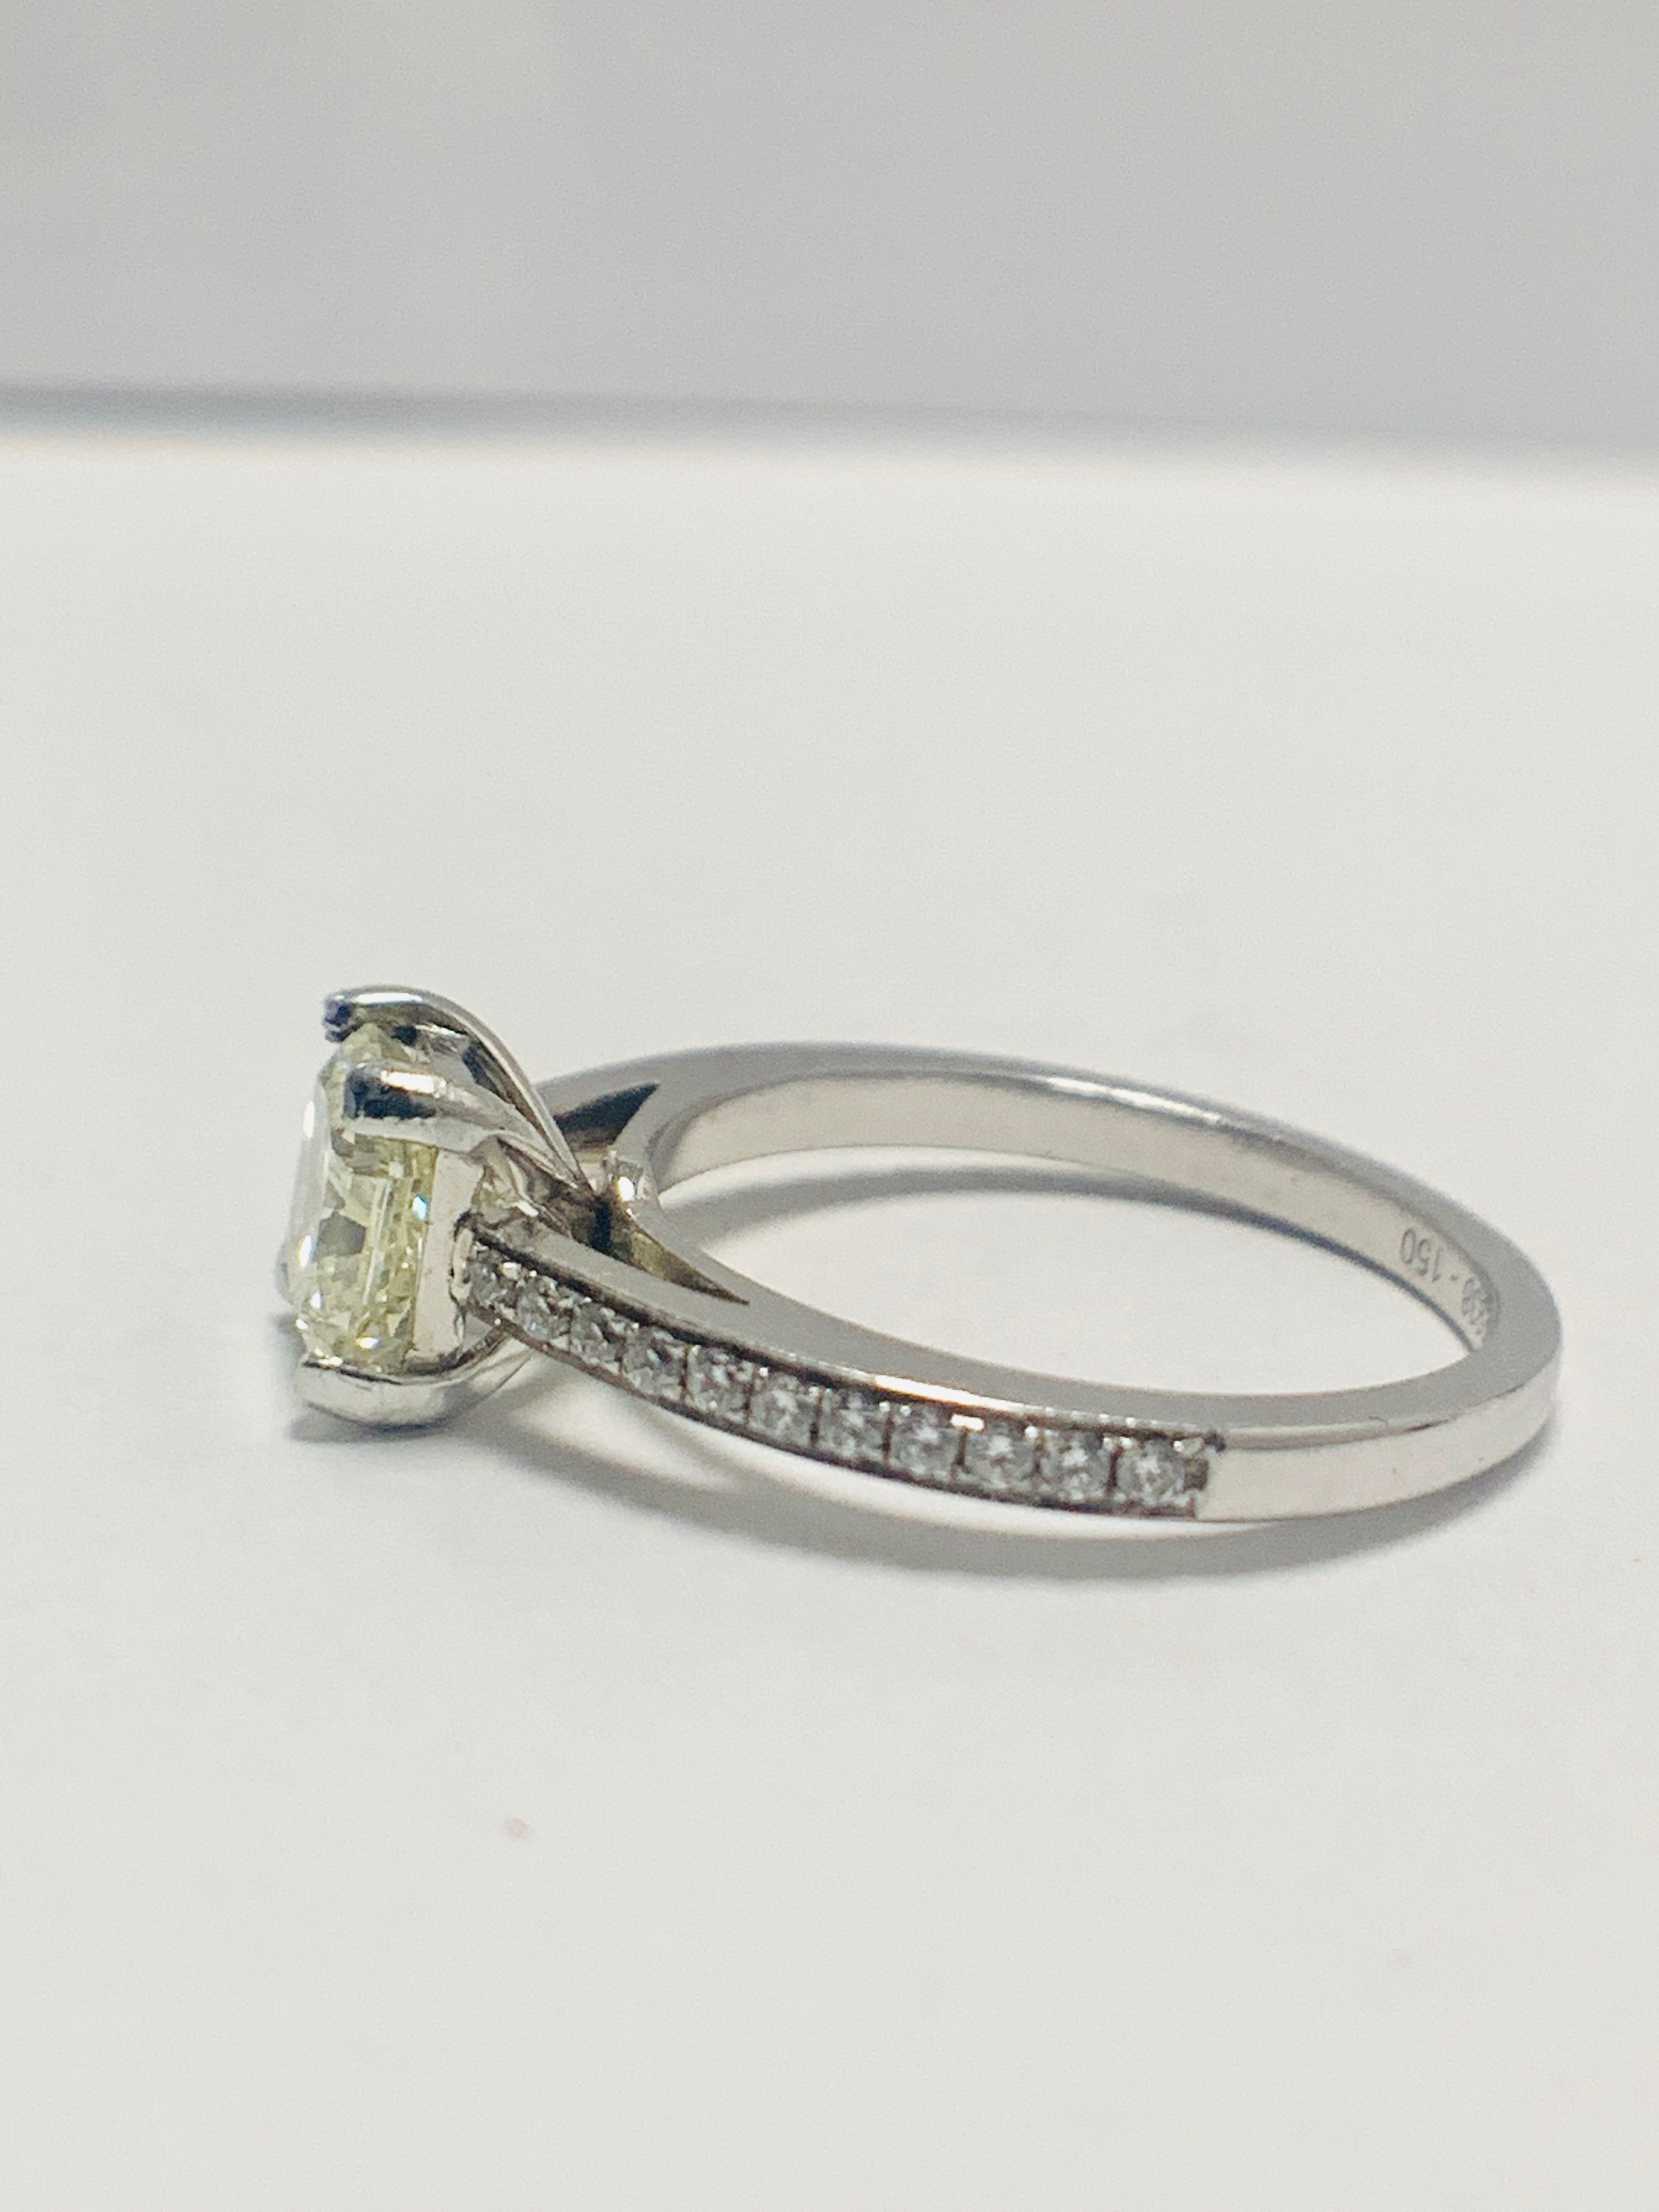 1ct cushion cut platinum diamond solitaire ring - Image 3 of 8